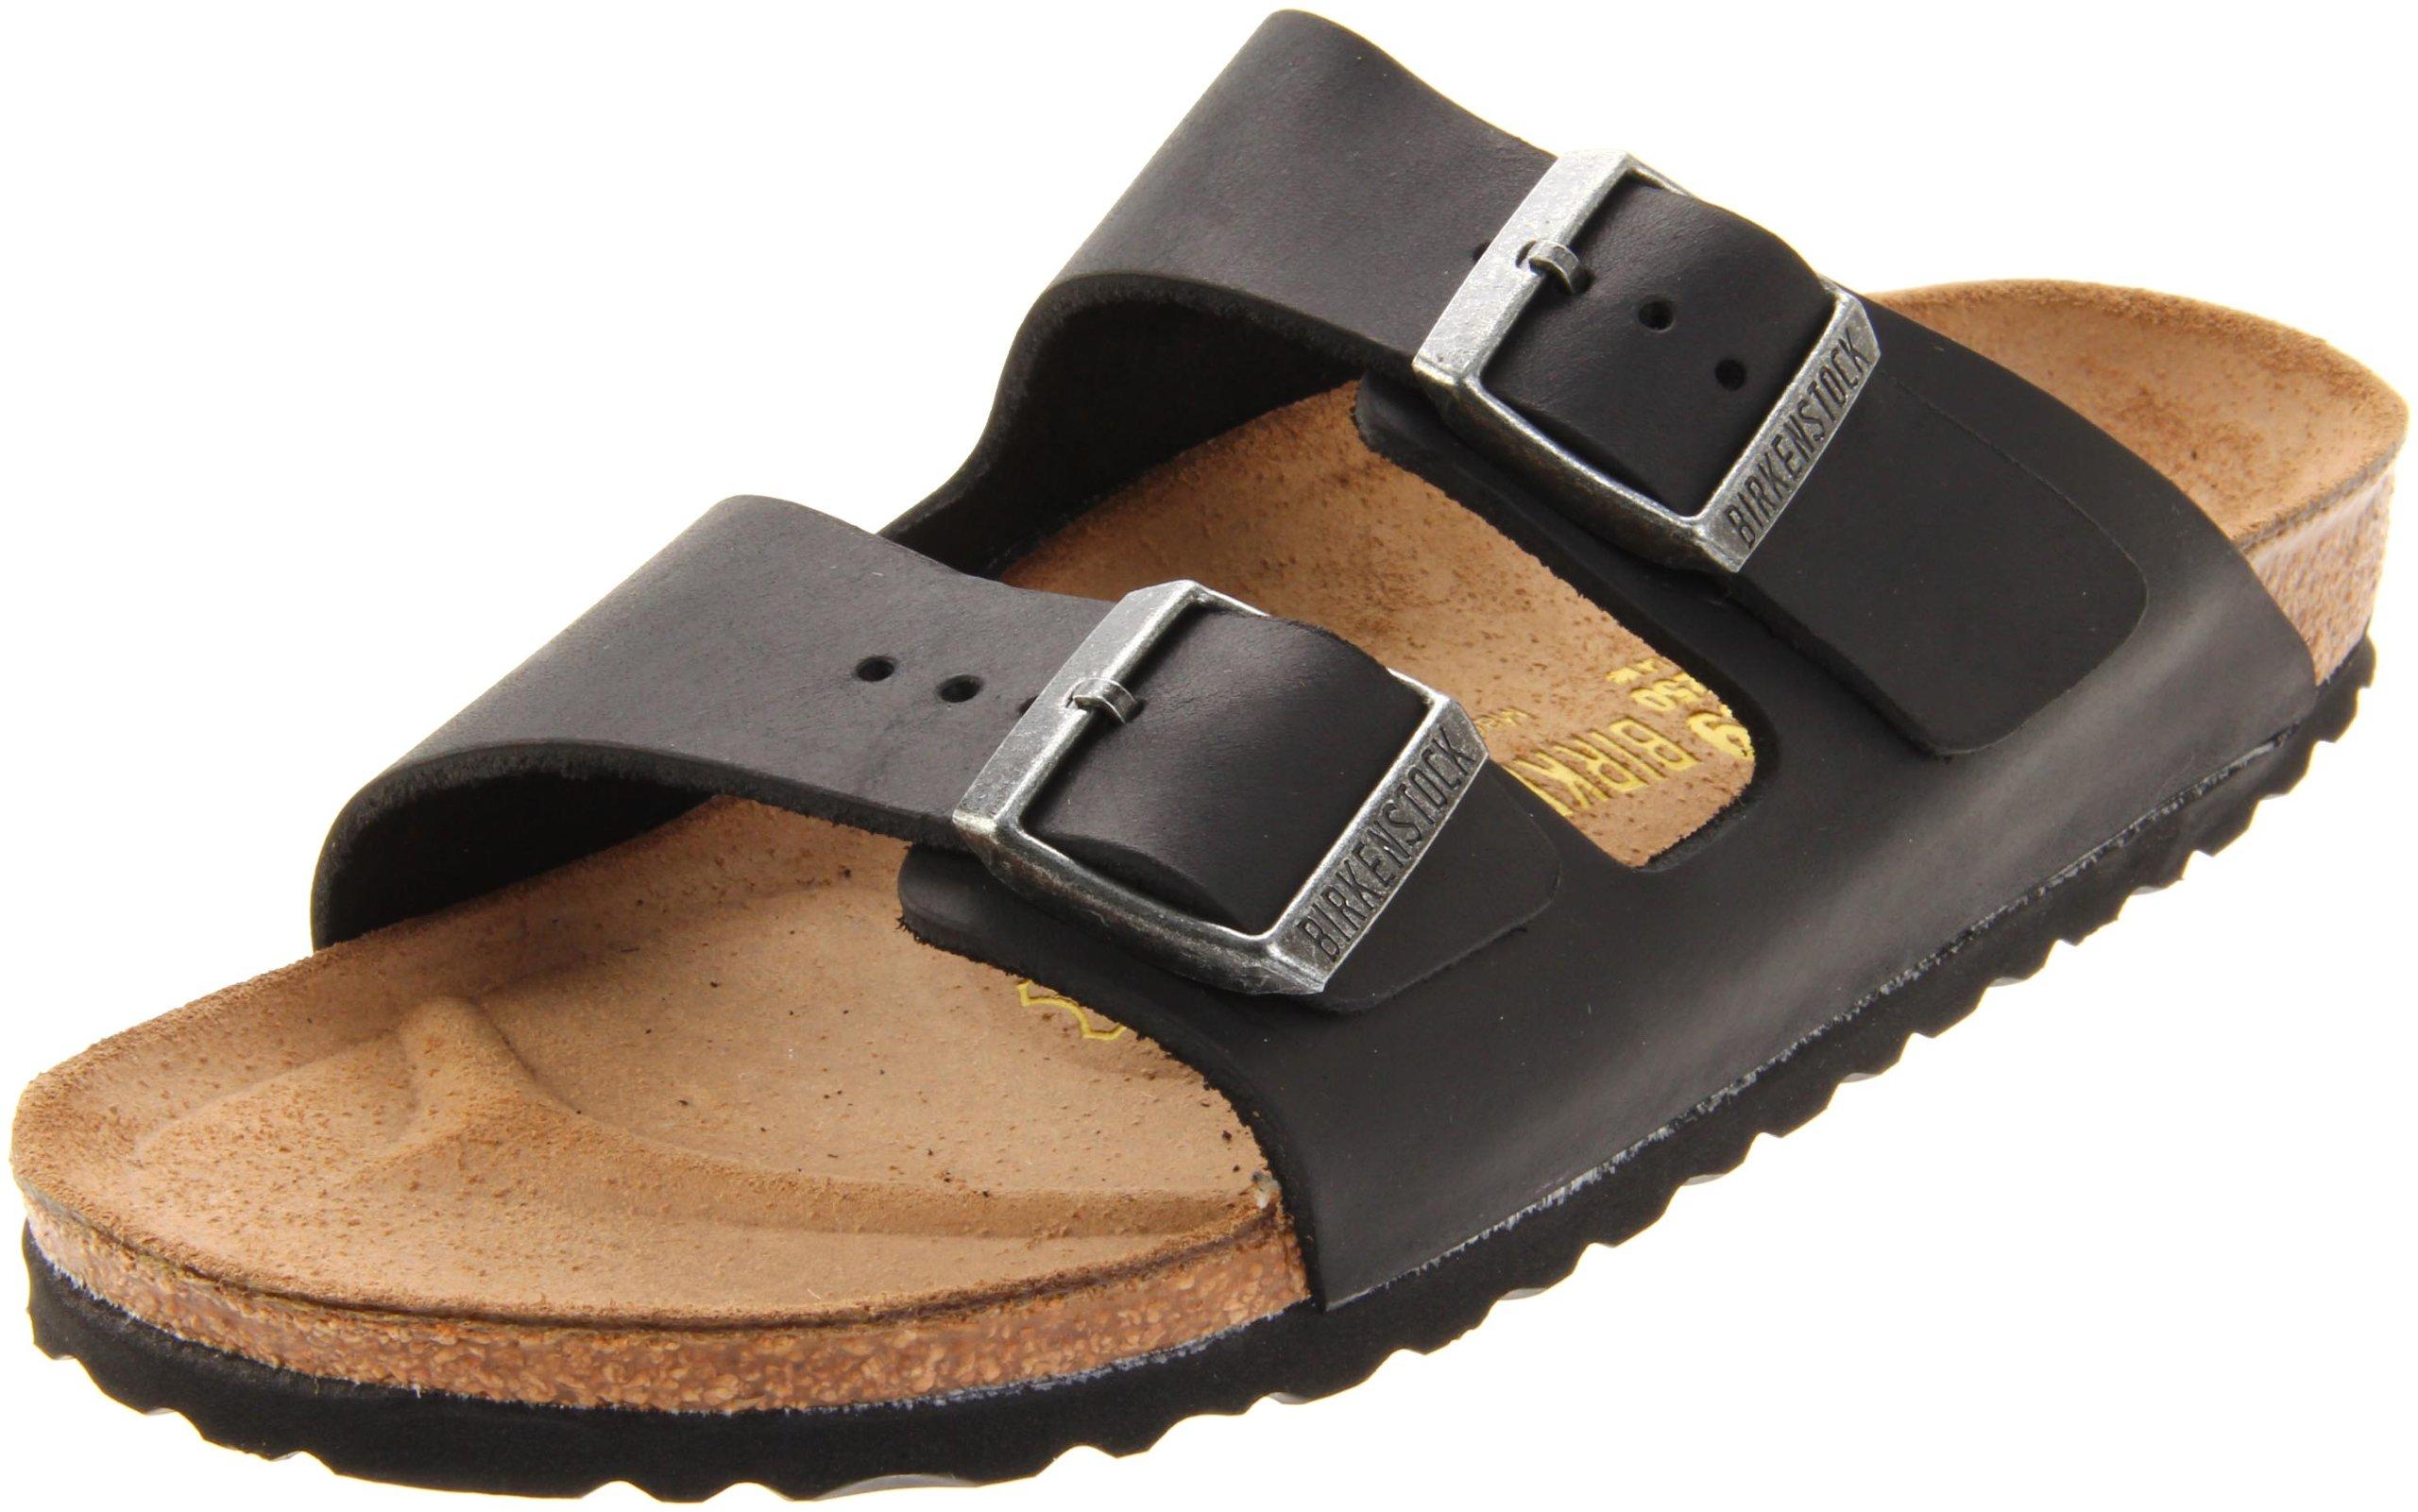 Birkenstock Arizona Black Oiled Leather Sandal 37 N (US Women's 6-6.5)